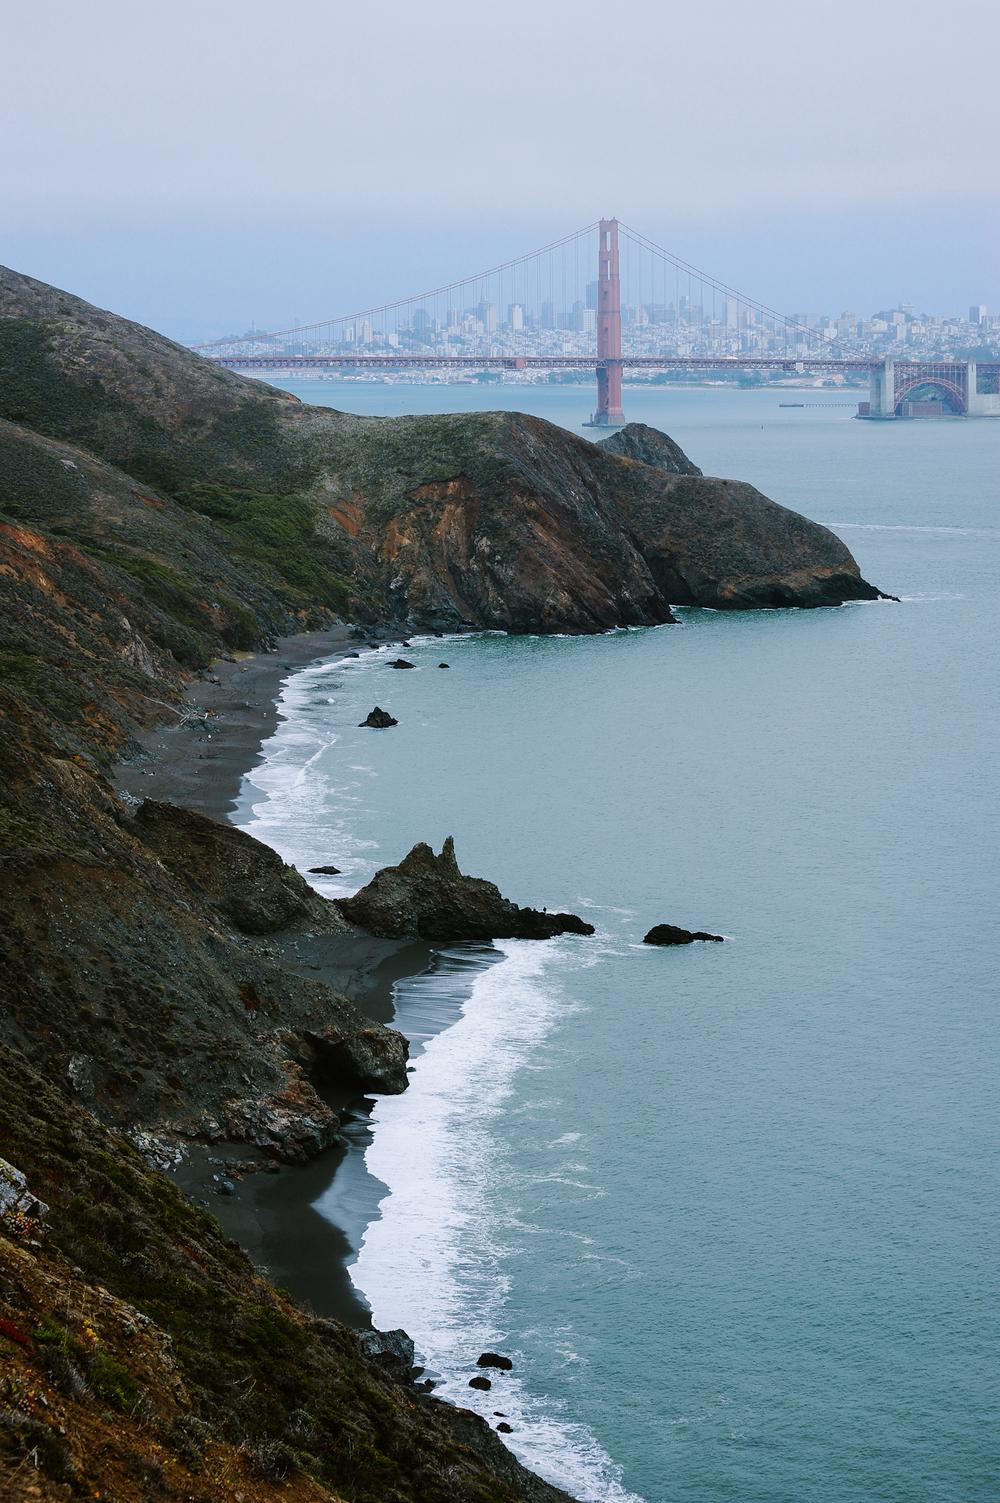 San Francisco from Bonita Cove Bunker